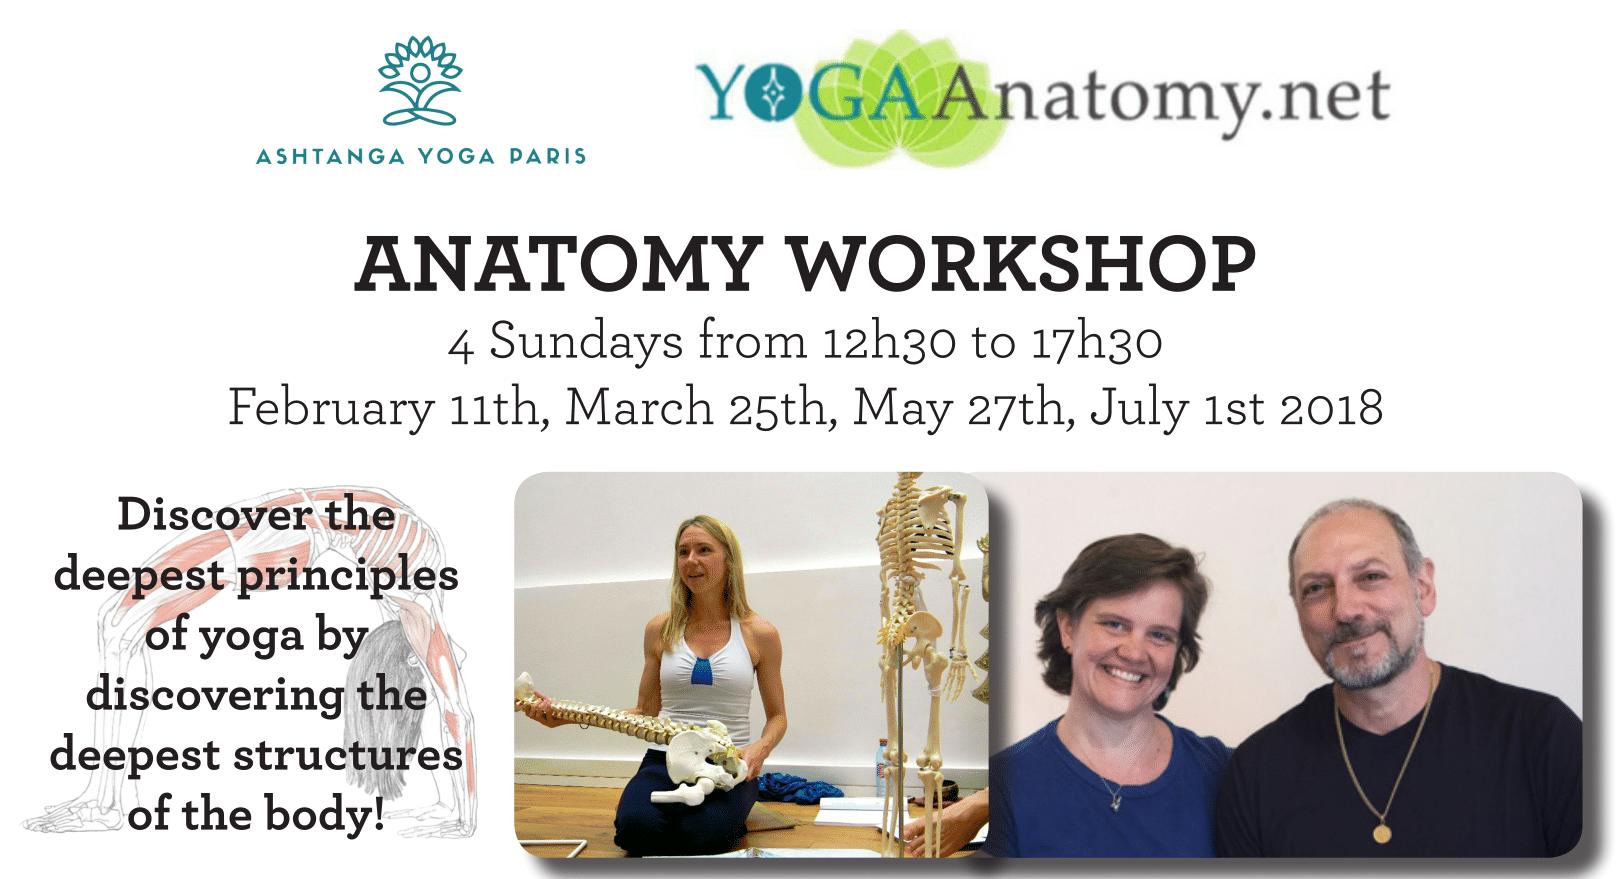 Anatomy Workshop with Linda Munro + Leslie Kaminoff & Amy Matthews